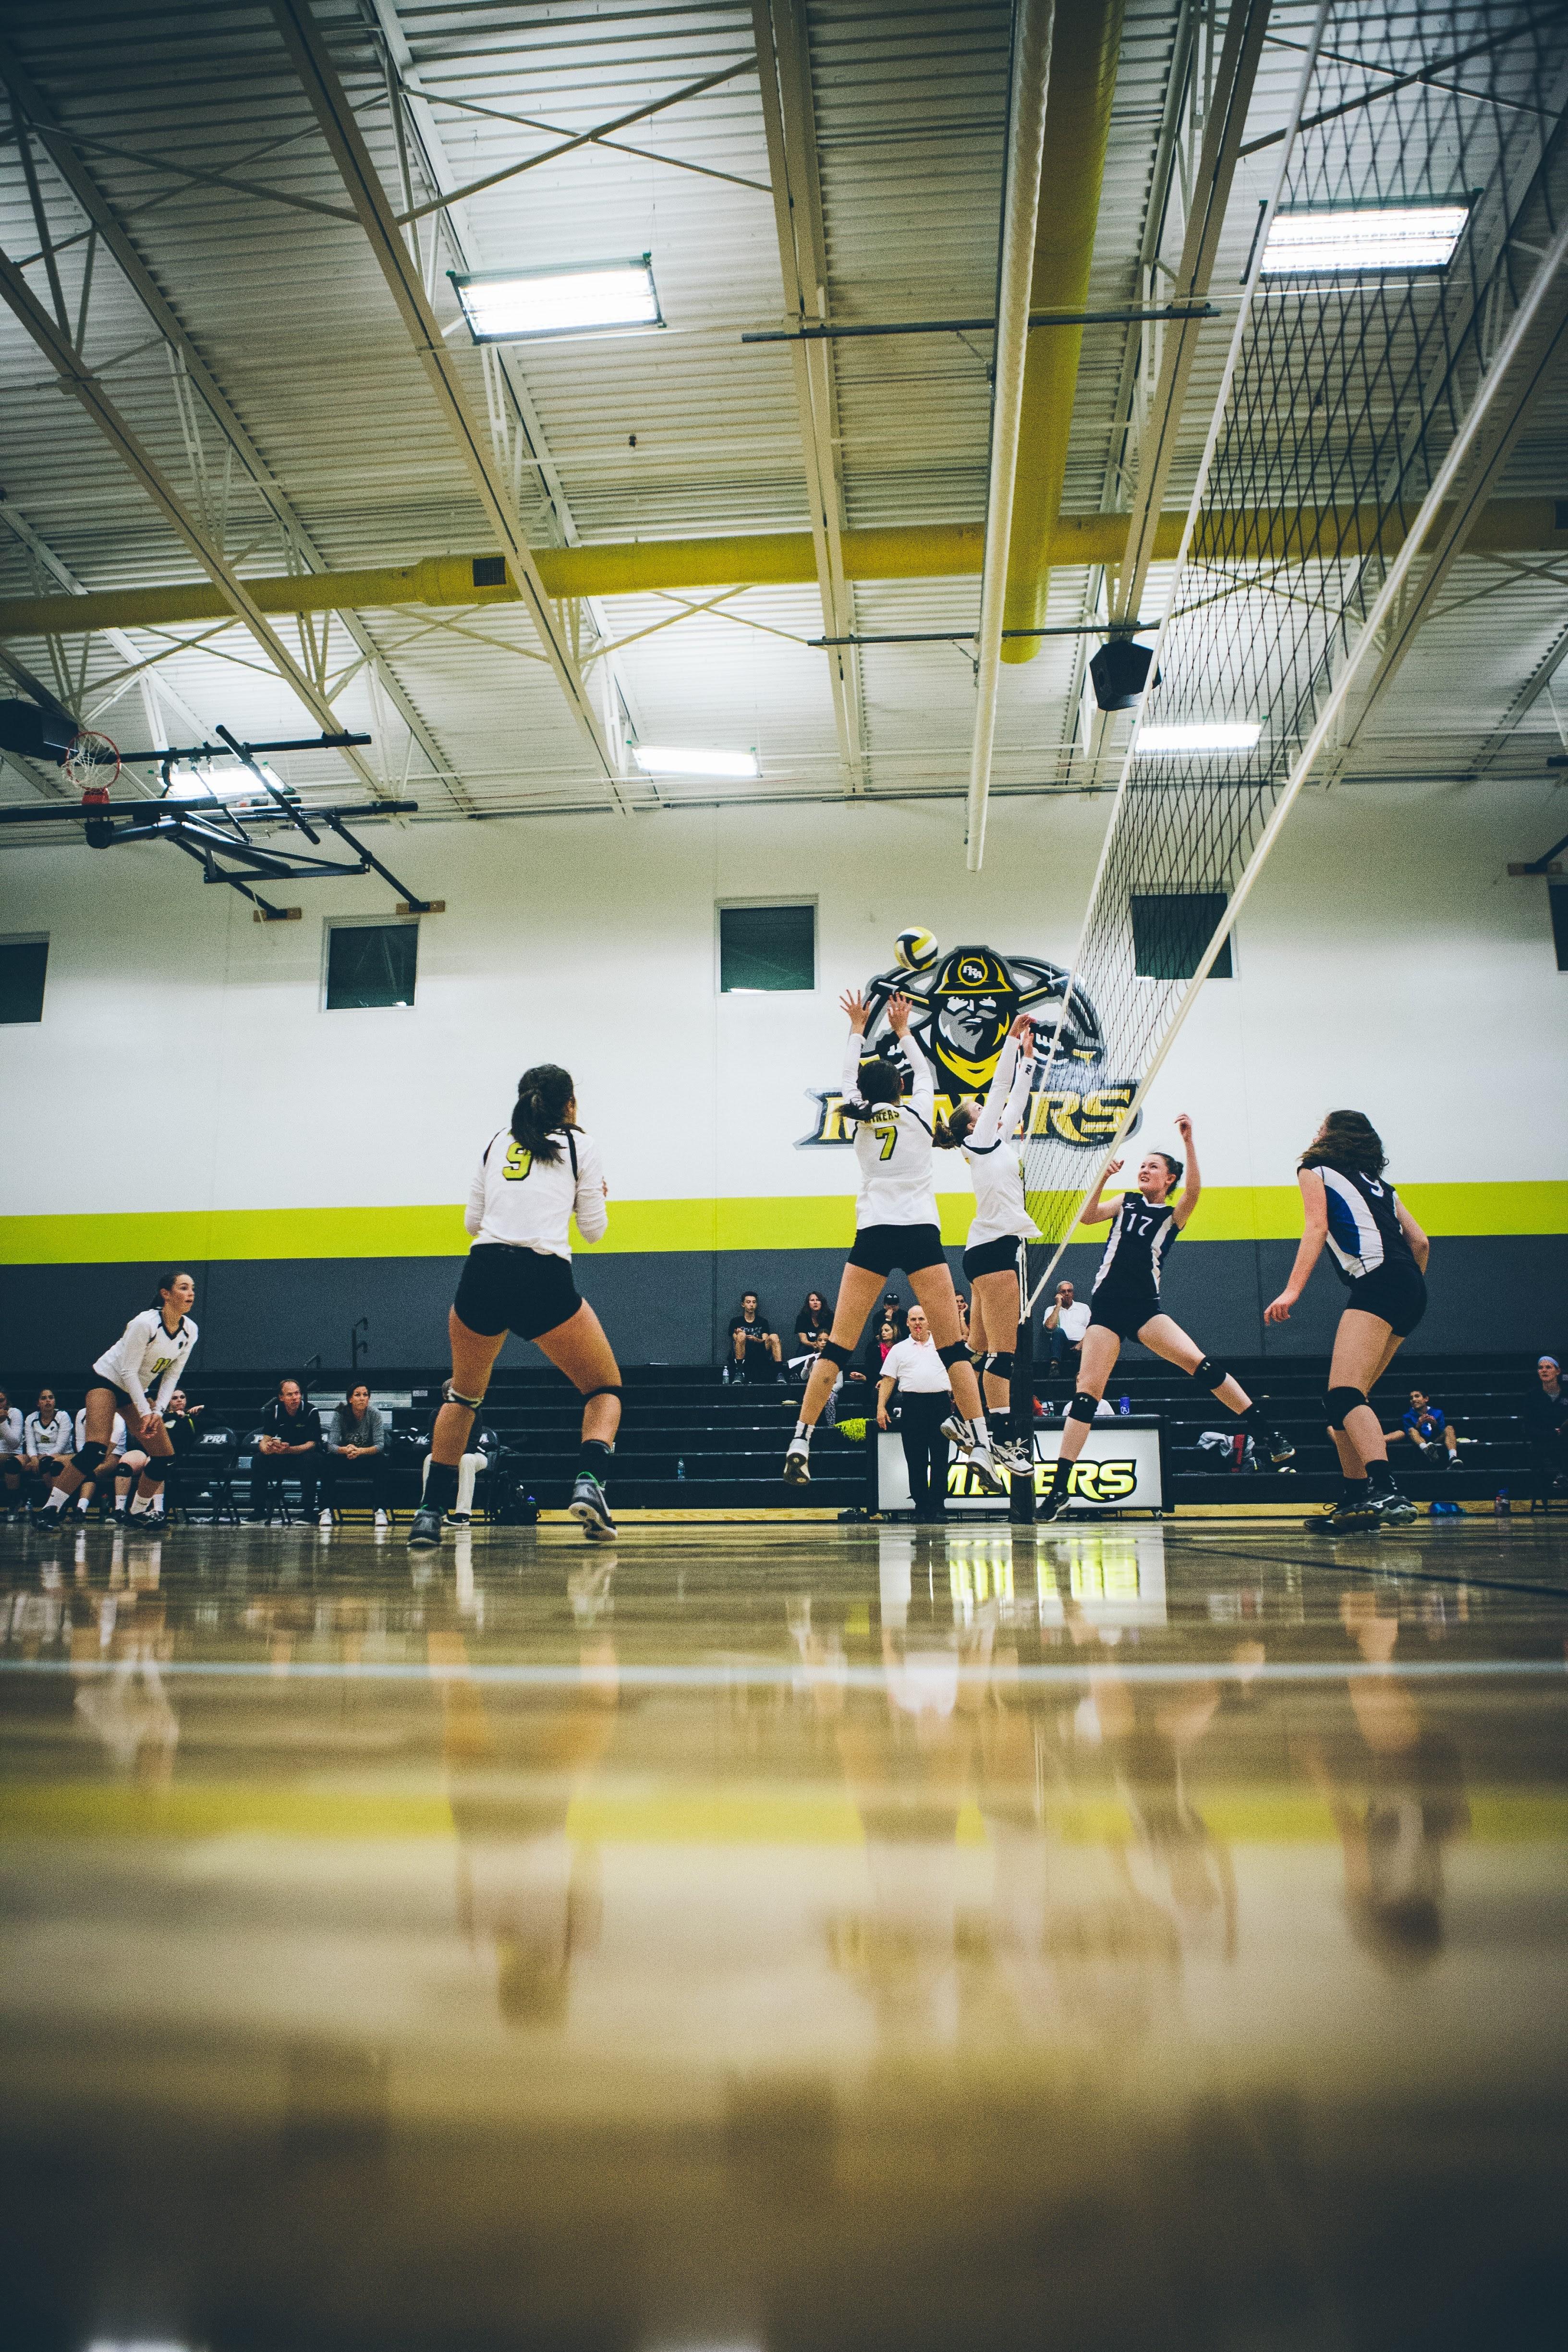 PRA Volleyball players blocking